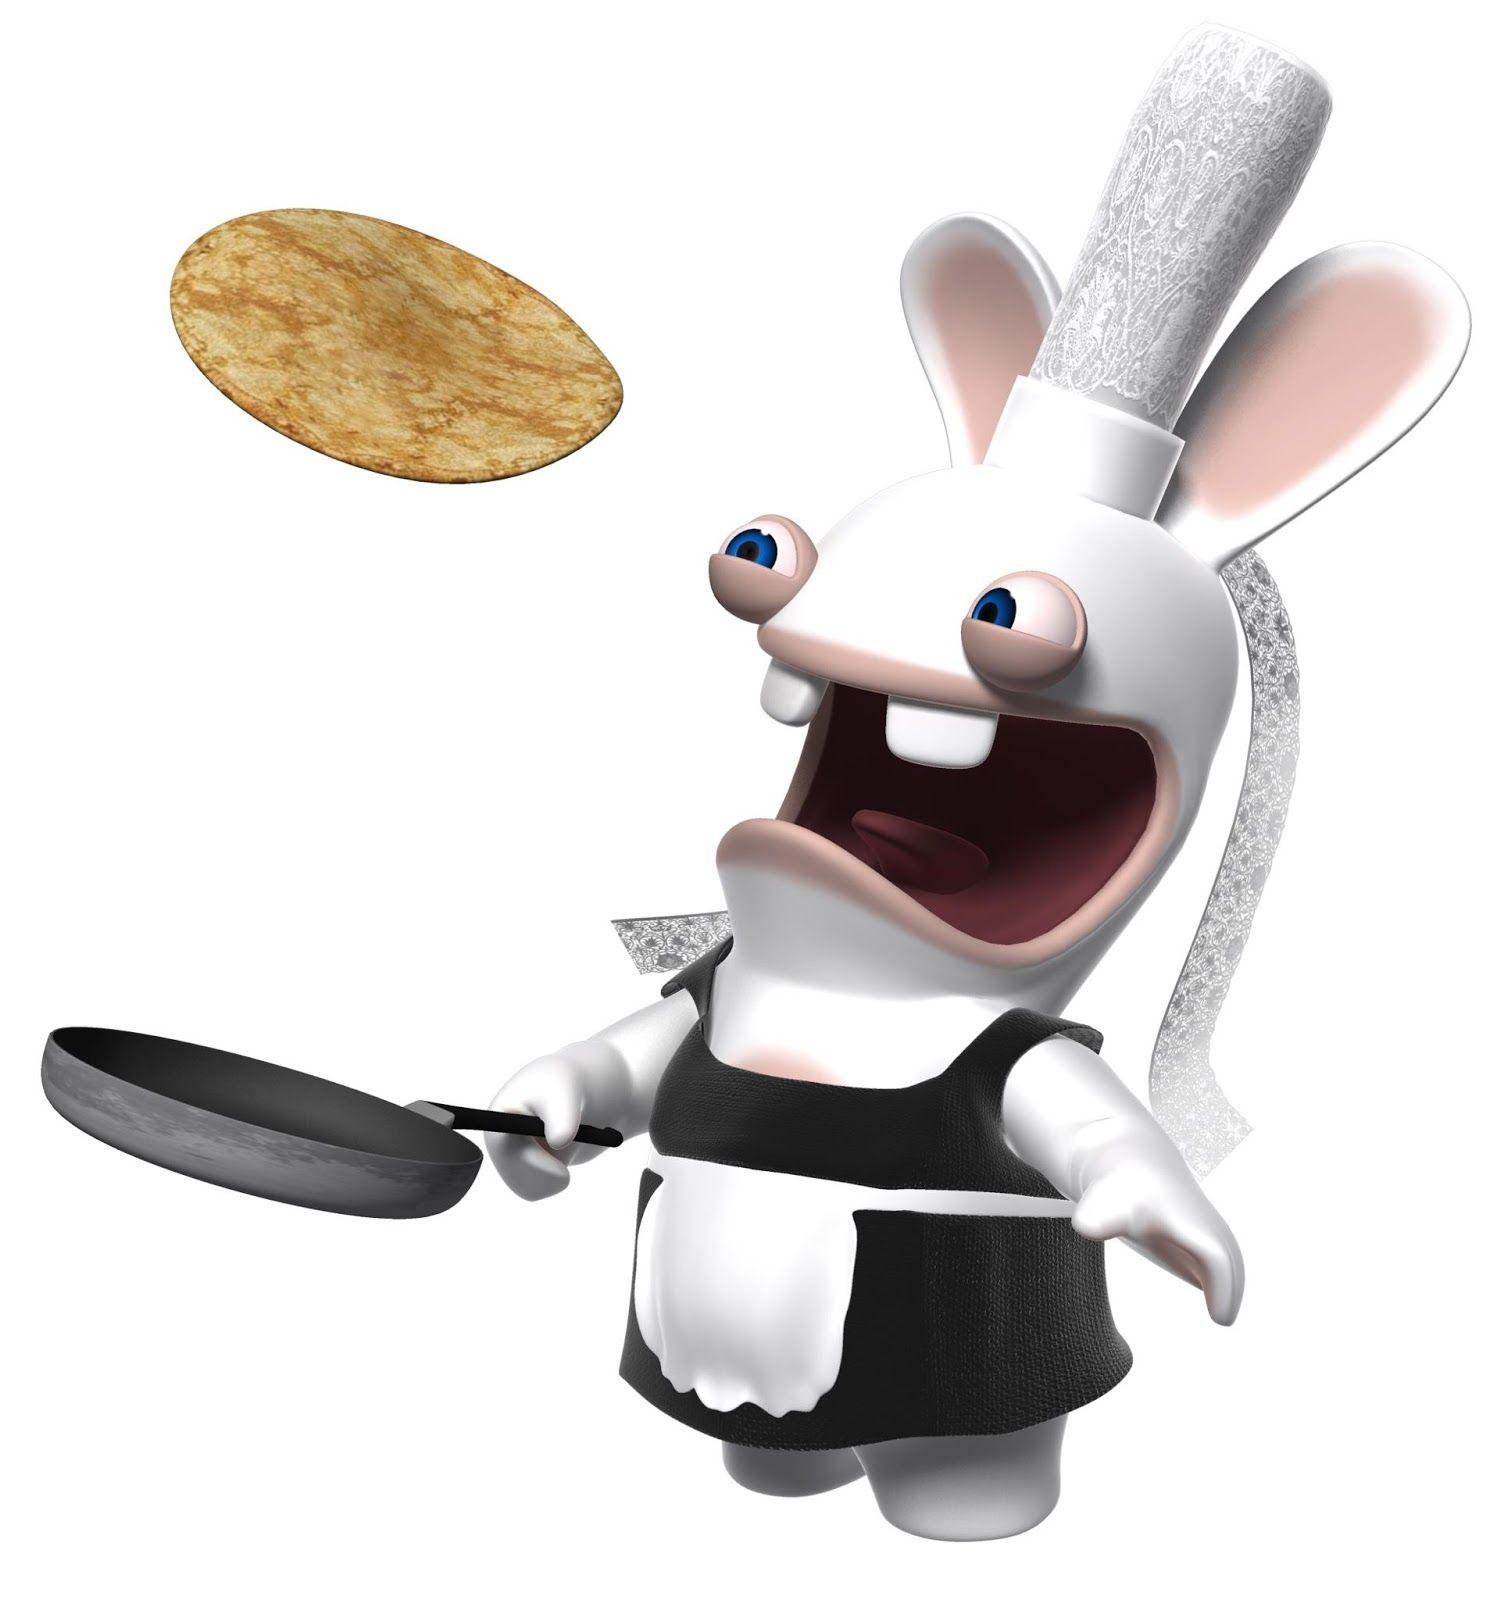 Lapin cretin cr tin pinterest lapin les lapins cr tins et chandeleur - Lapin cretin image ...